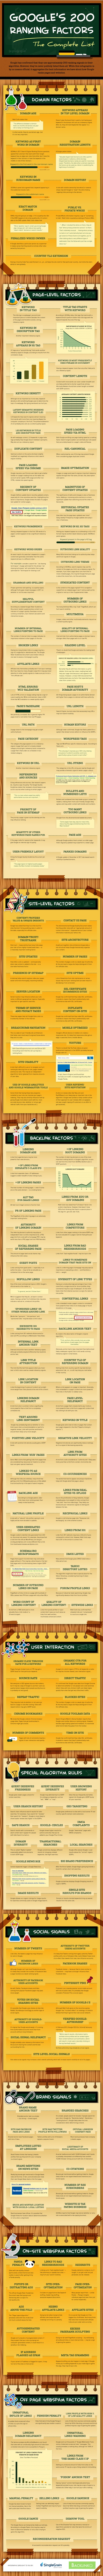 Google's 200 Ranking Factors infographic